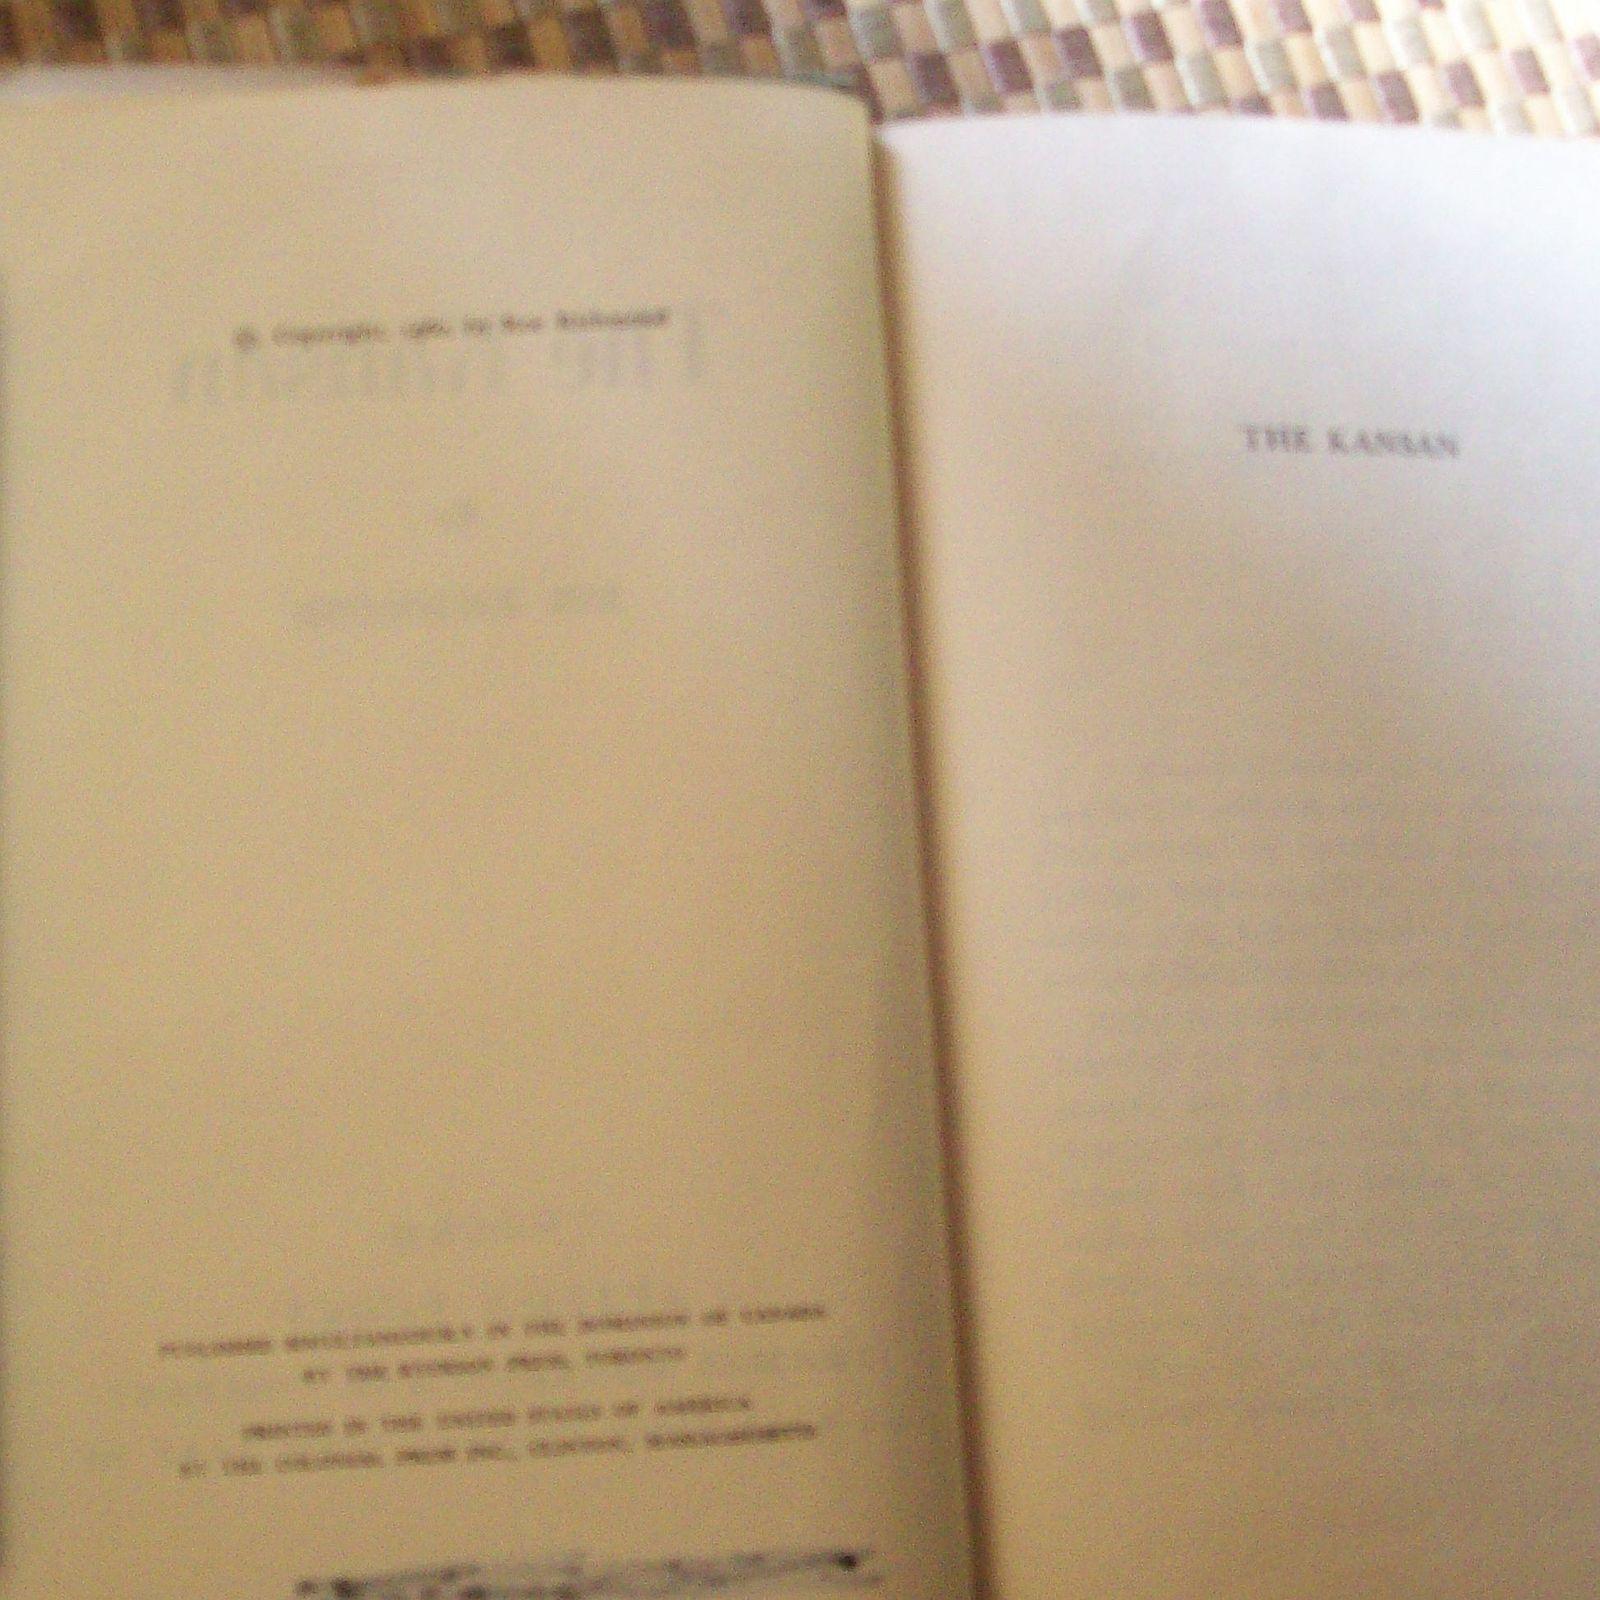 The Kansan by Roe Richmond 1960 HBDJ